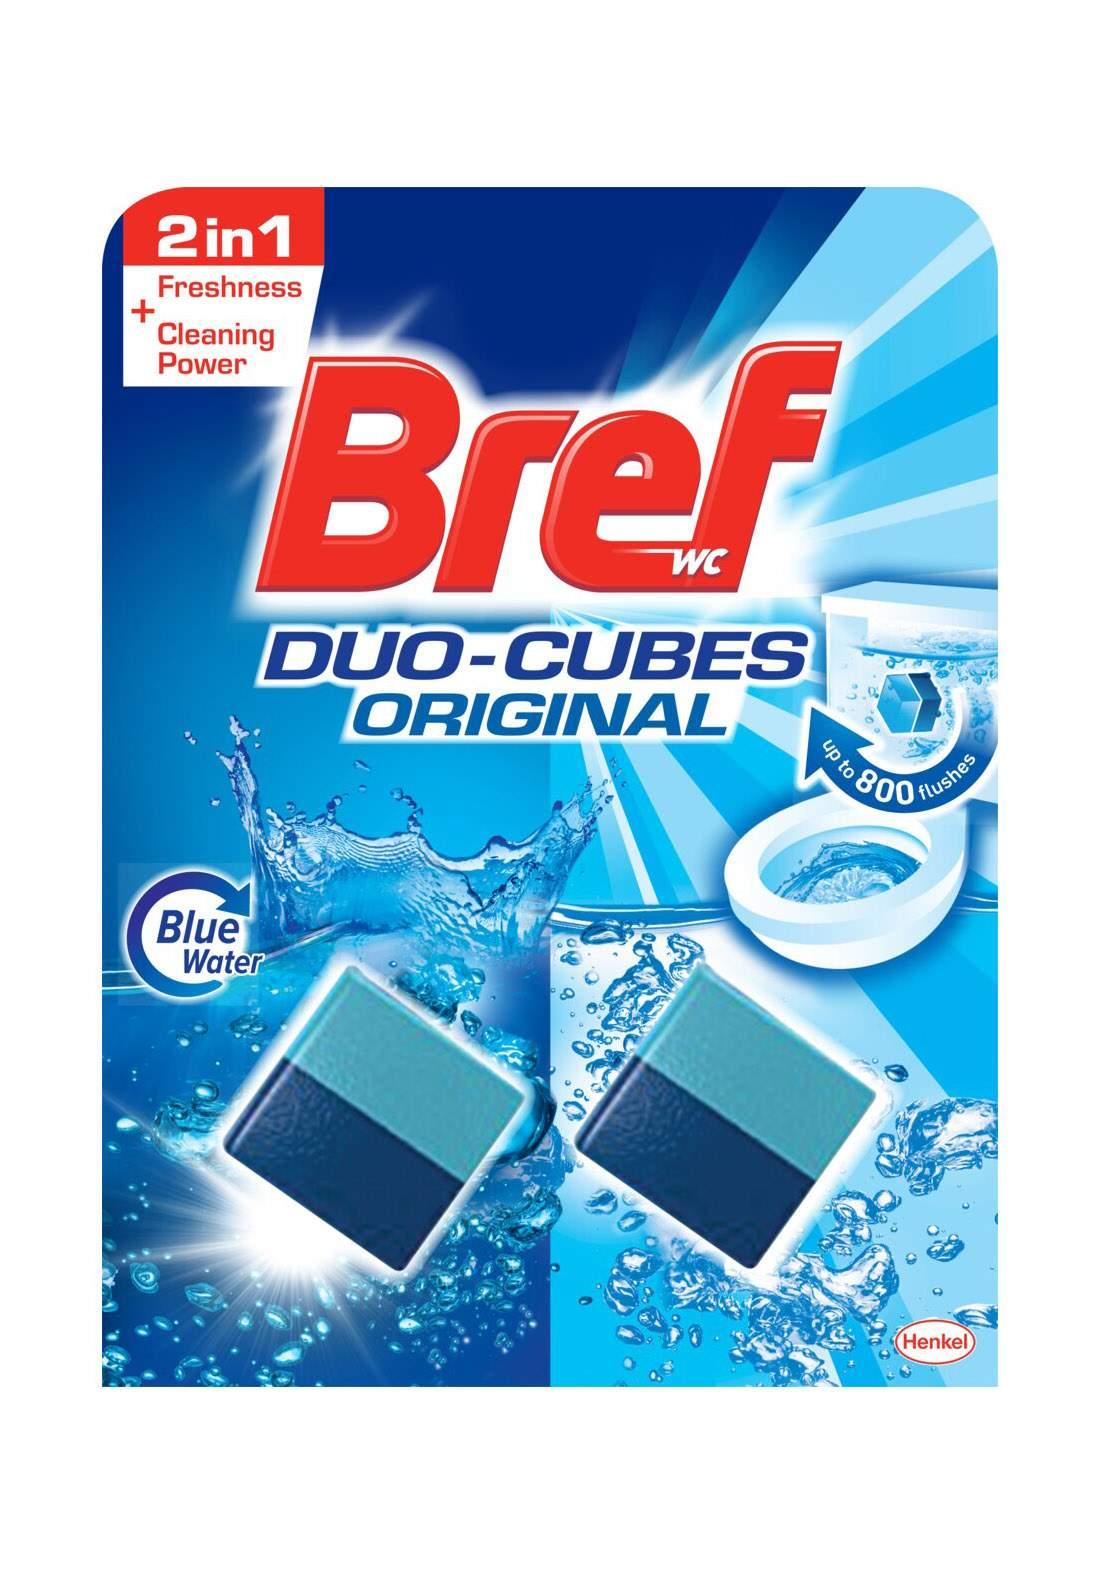 Bref Duo Cubes In Cistern Toilet Cleaner, 2 x 50g مكعبات تنظيف المراحيض